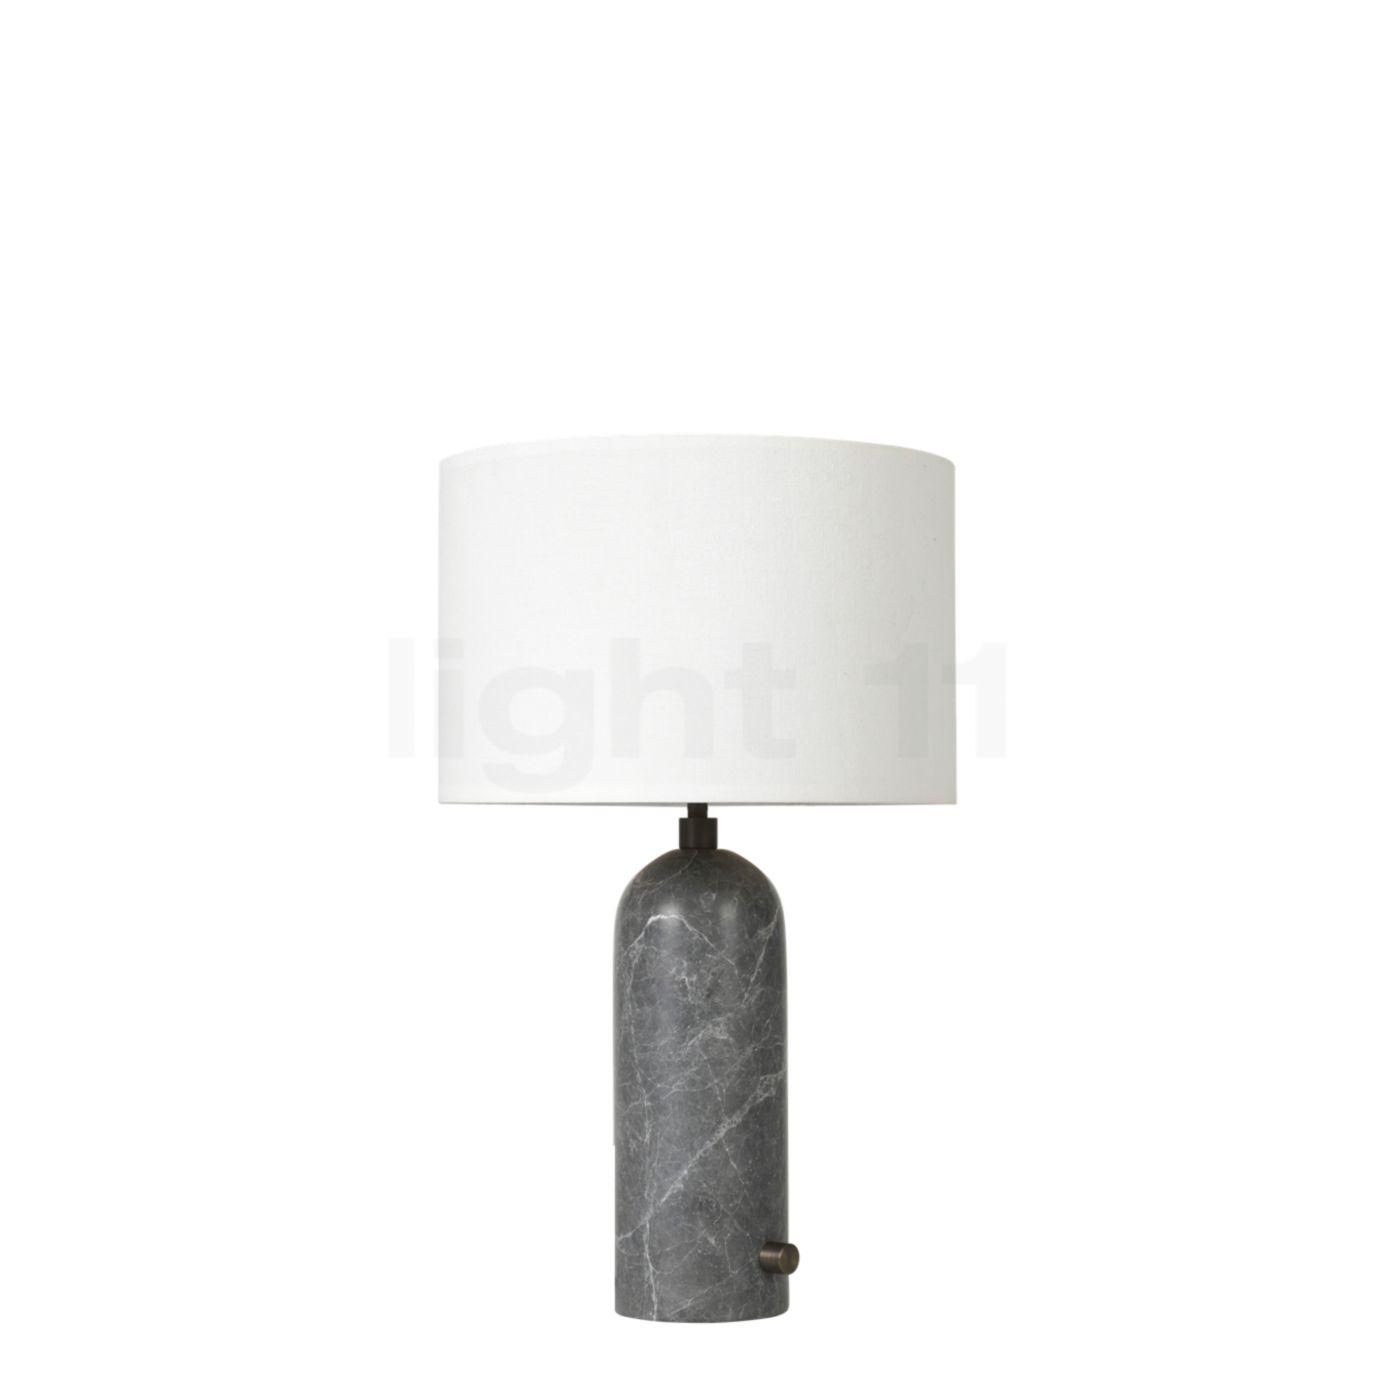 Gubi Gravity Table Lamp Small Buy At Light11.eu